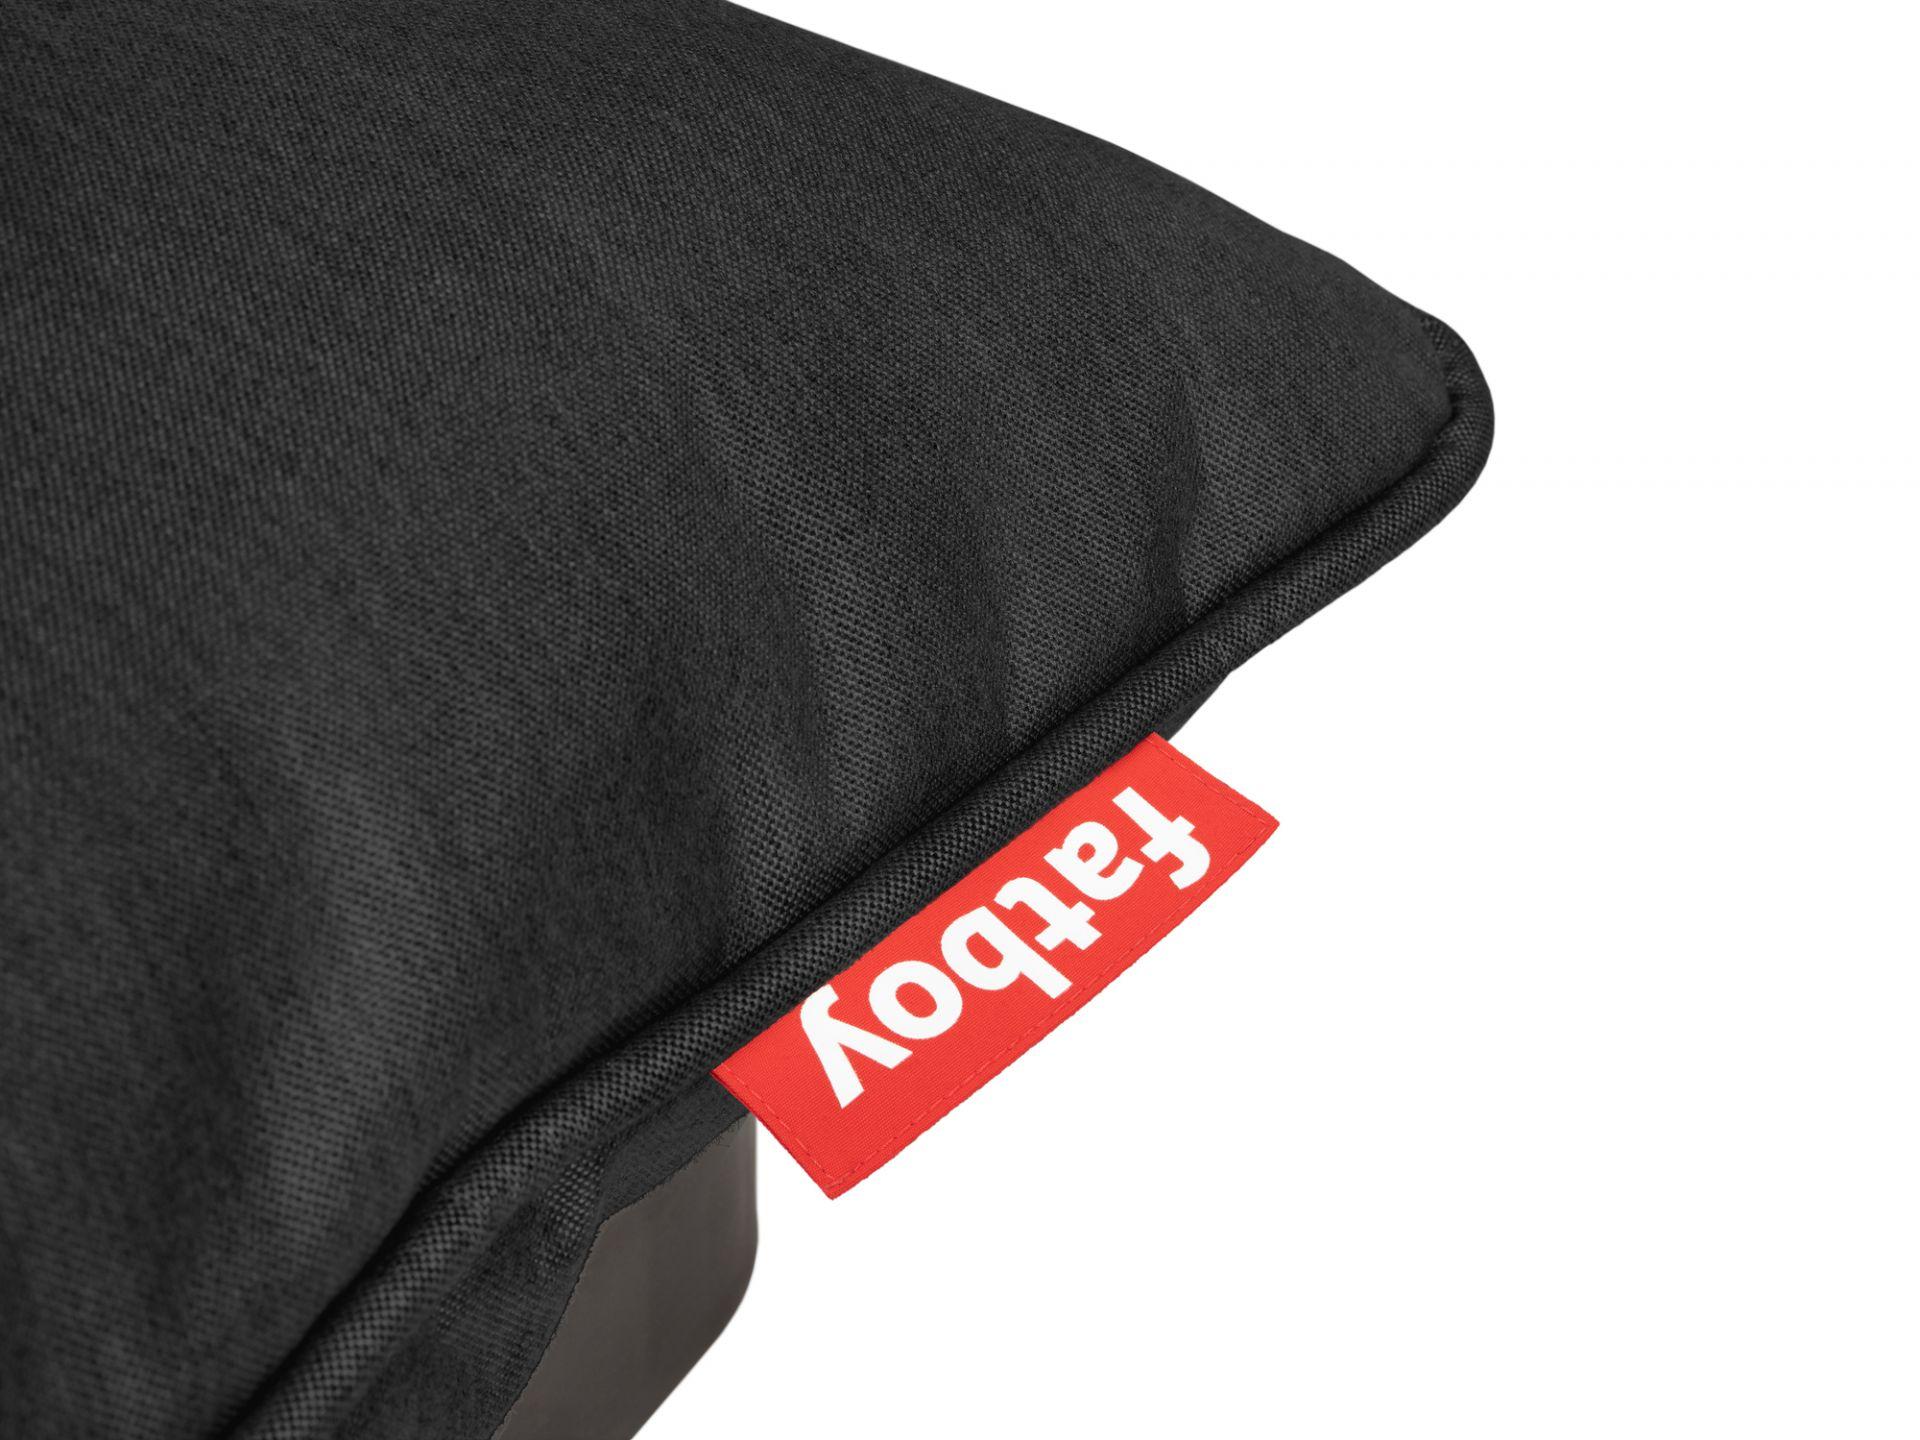 Paletti Seat Sofa Outdoor Fatboy Natur grau